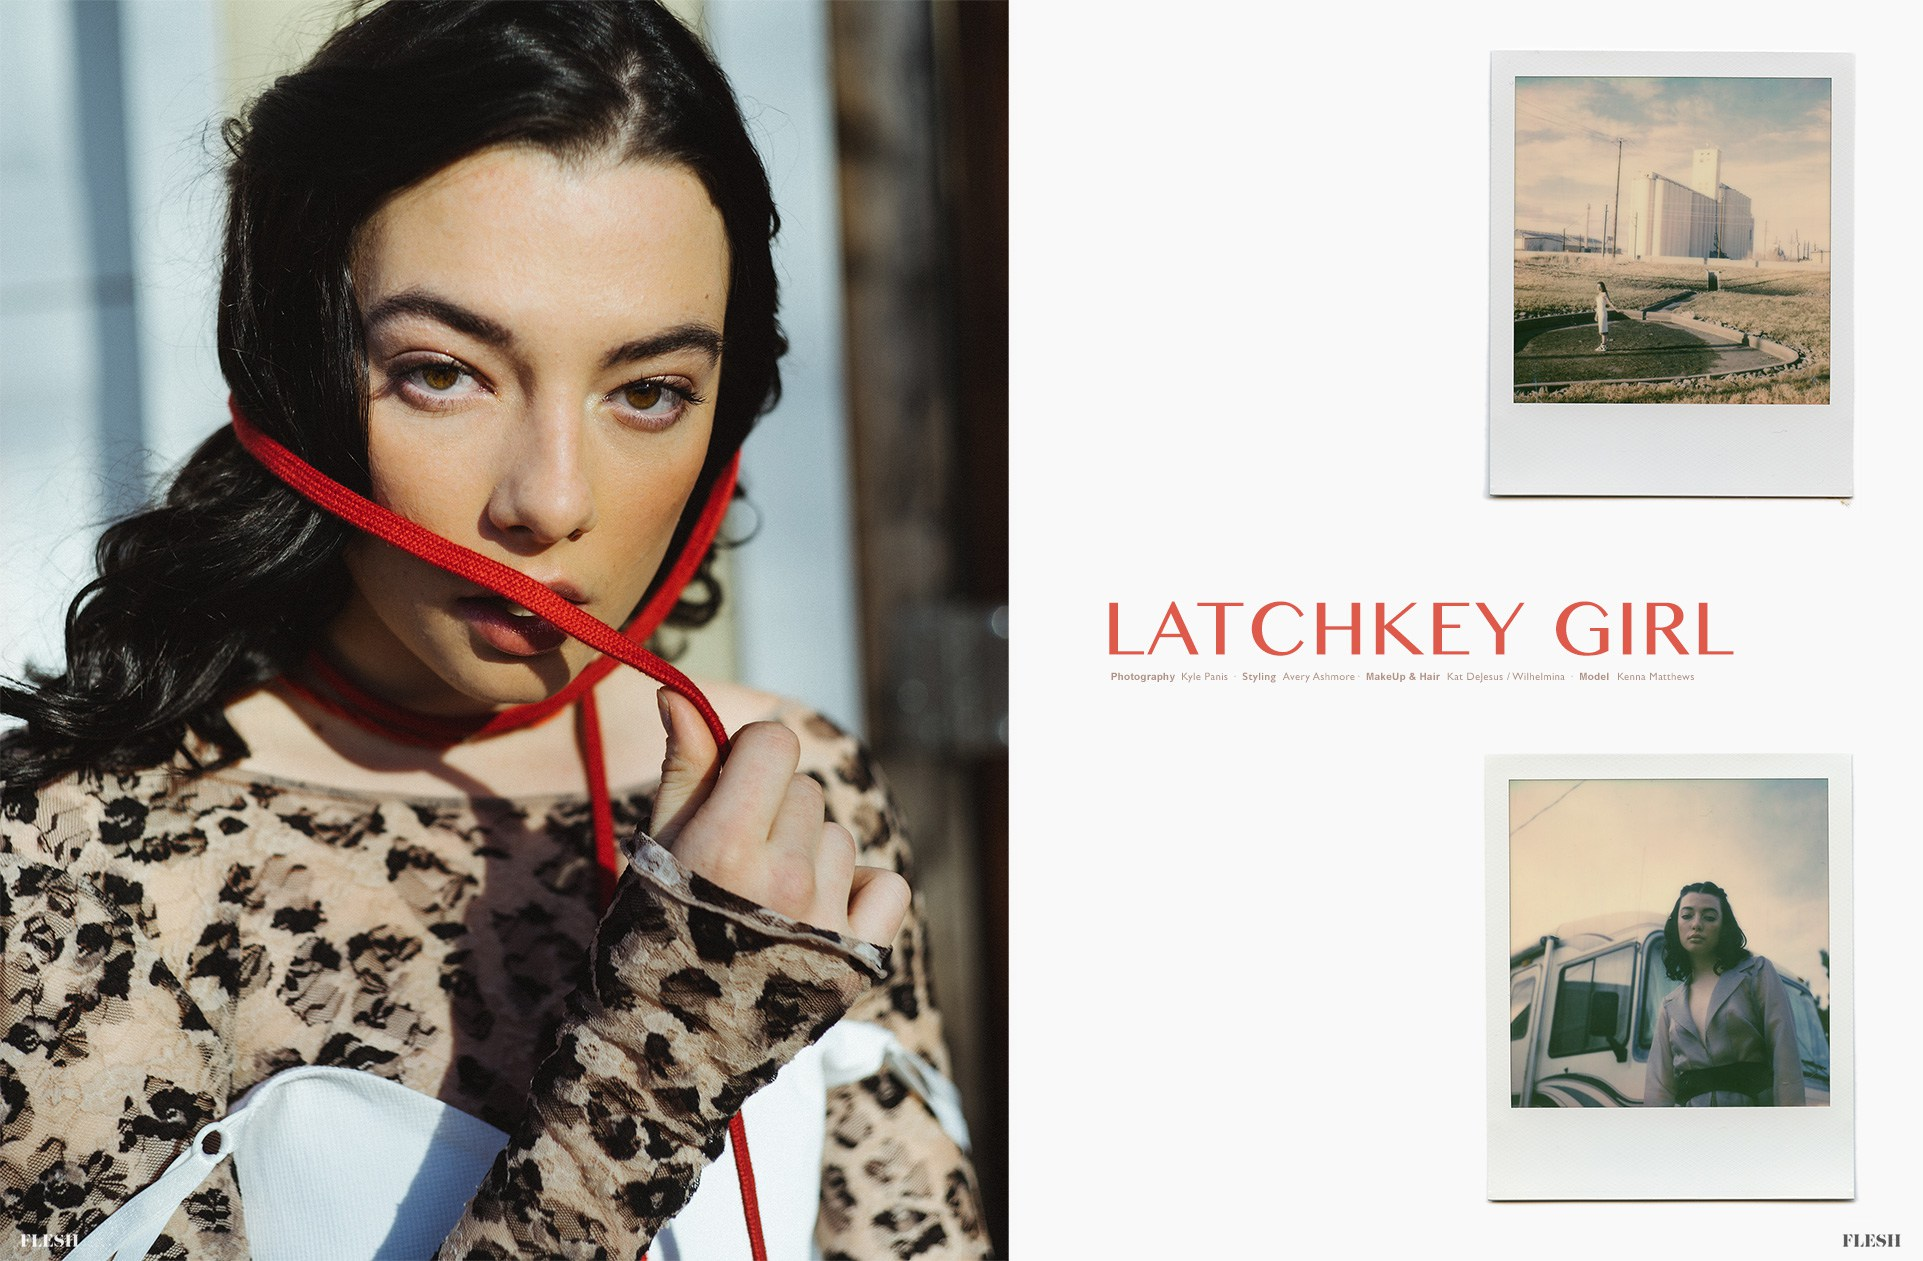 Latchkey-Girl-Kyle-Panis-01.jpg